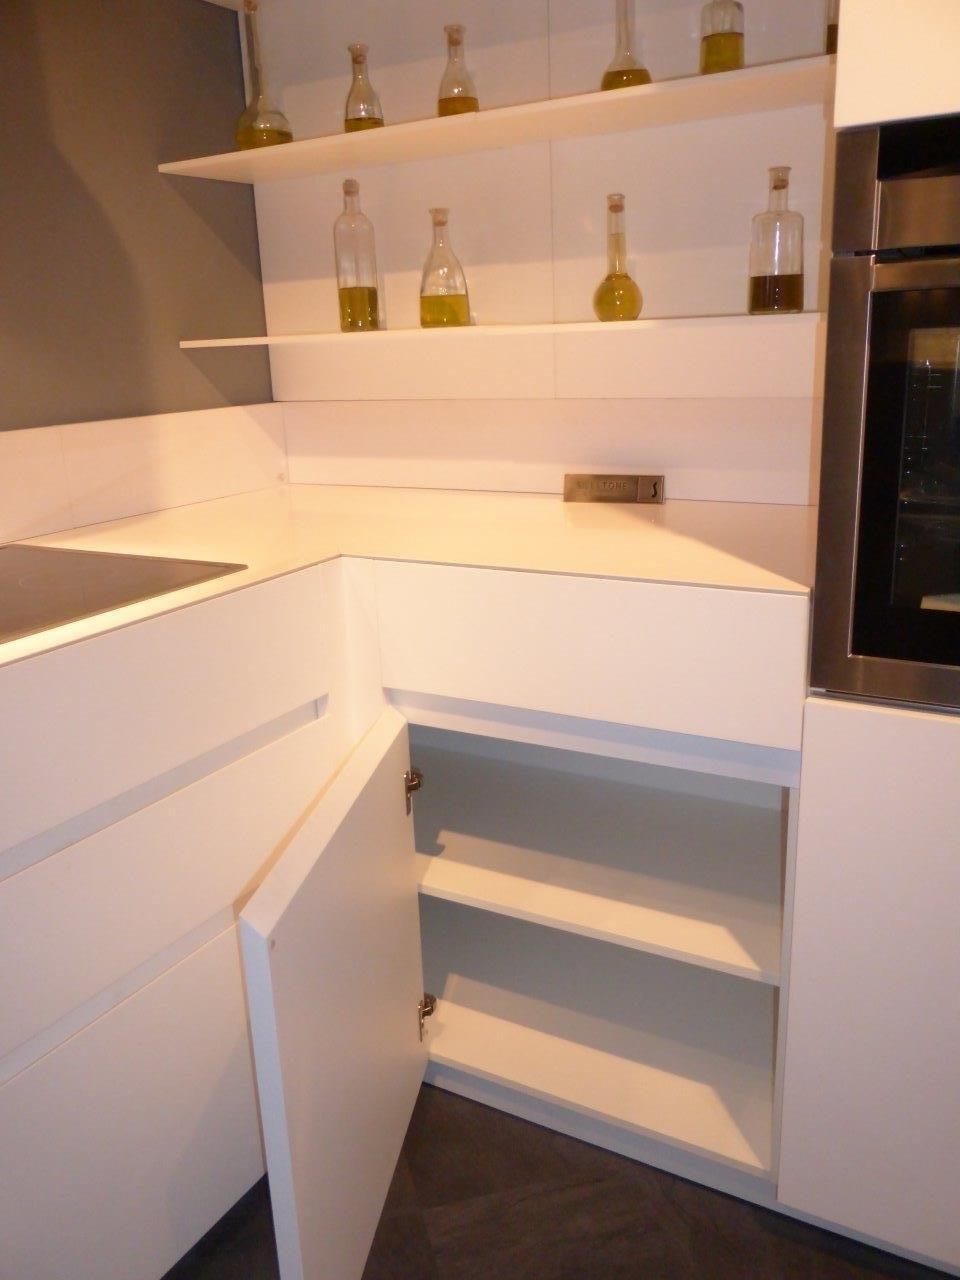 Cucina cesar elle scontata cucine a prezzi scontati - Base angolo cucina ...